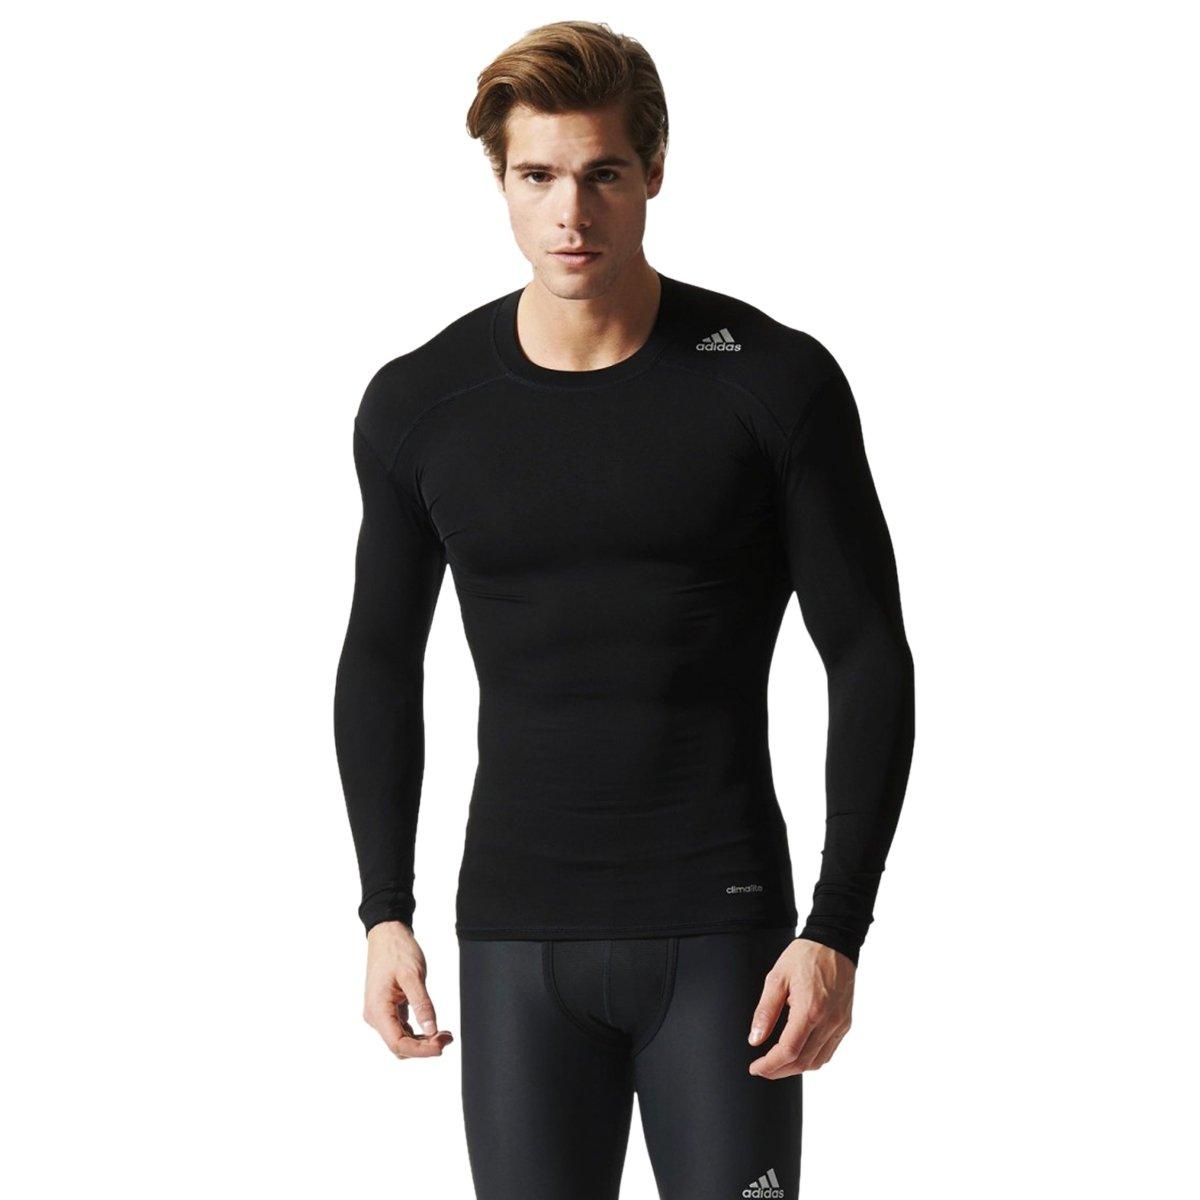 Bizz Store - Camiseta Compressão Masculina Adidas Techfit Base 4535870cdff81